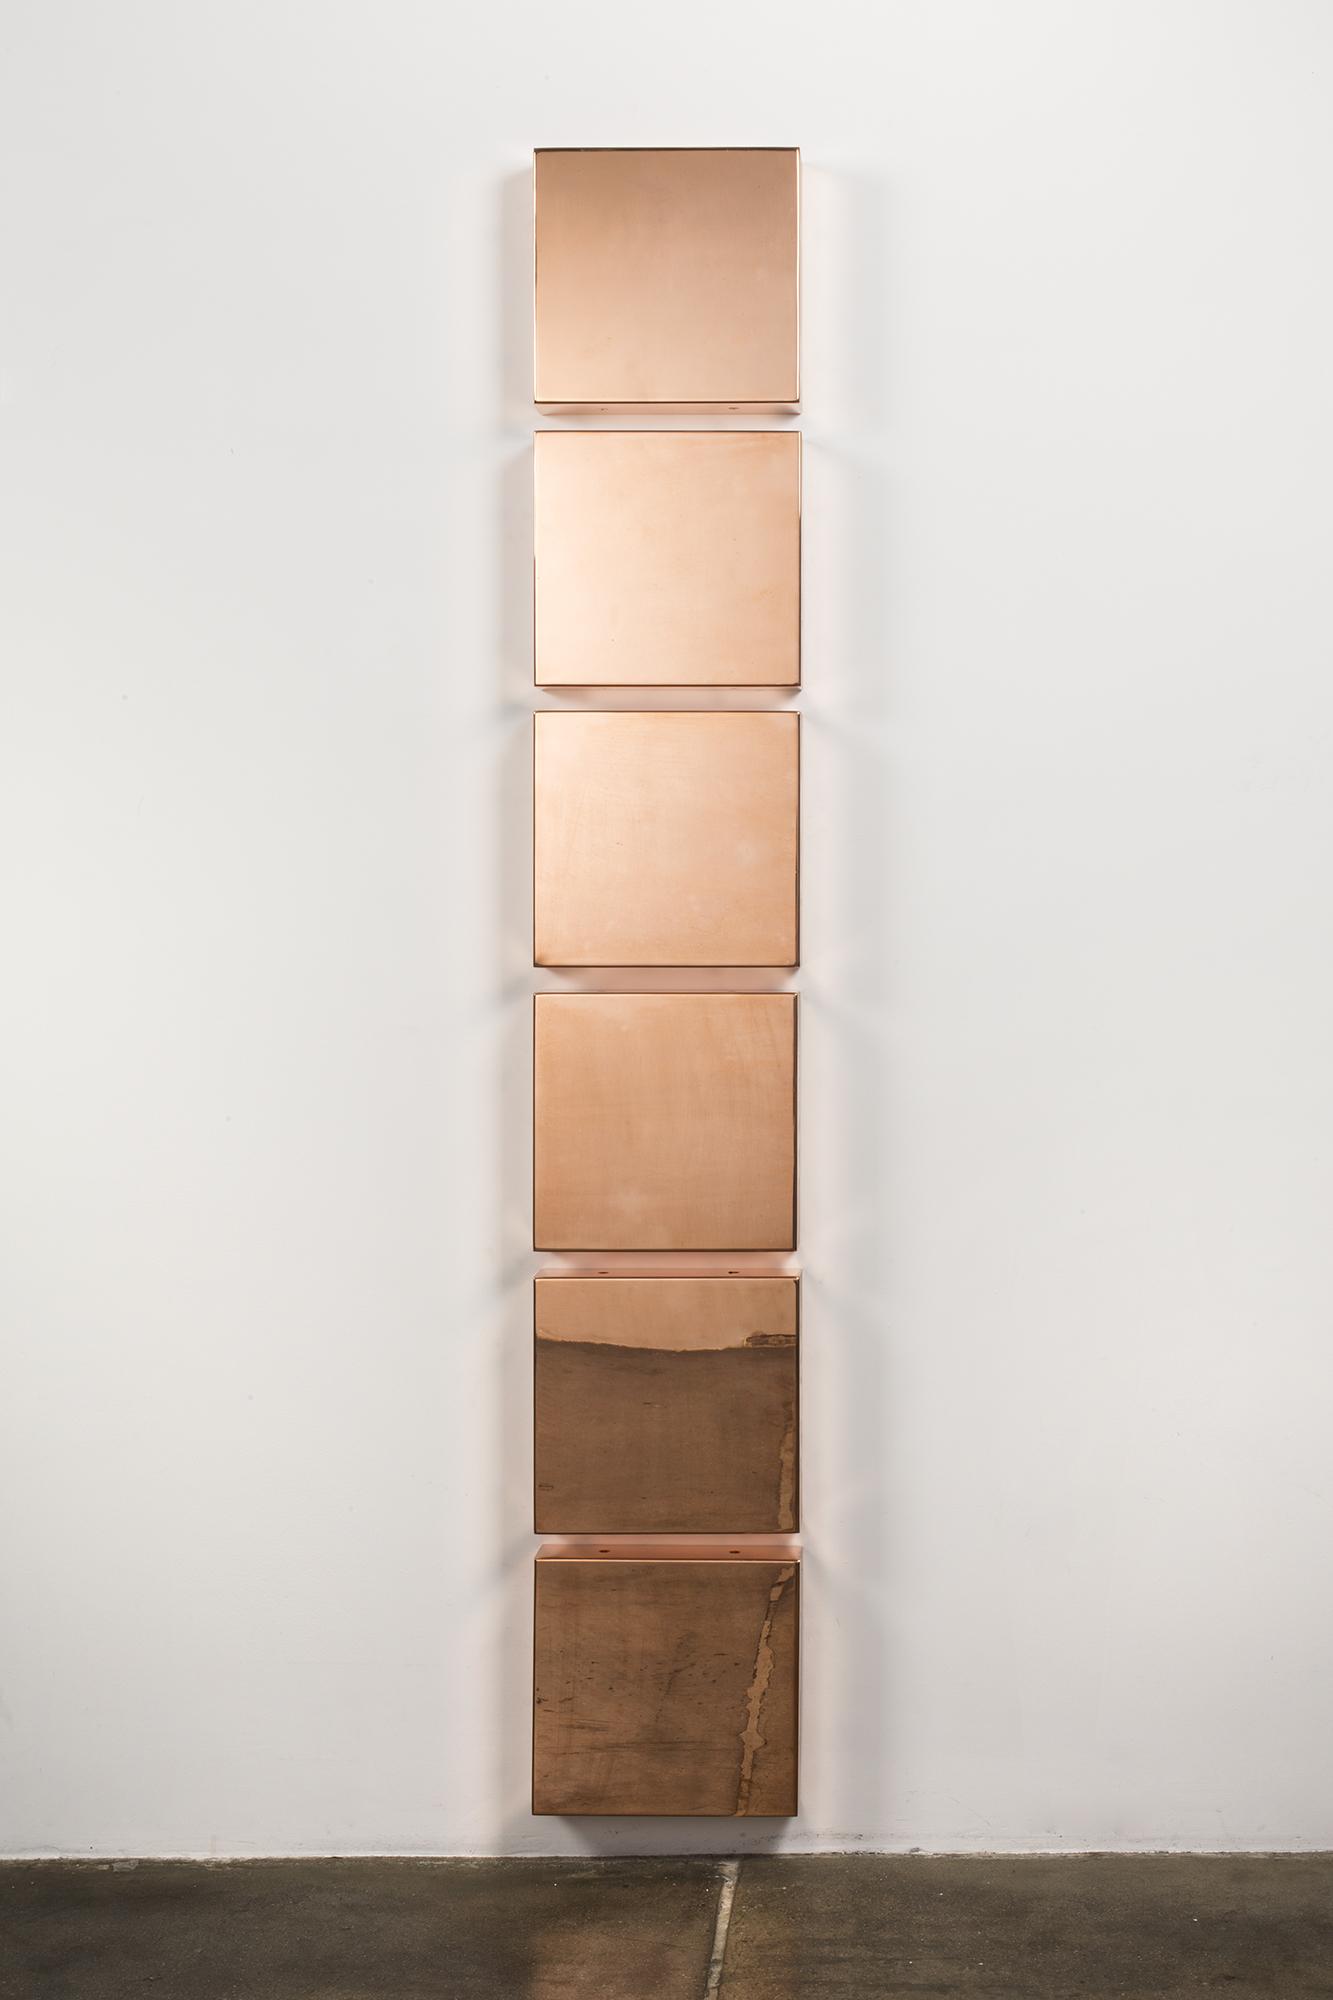 Copper Surrogate (48 ounce C11000 Copper Alloy: June 14, 2016, Basel, Switzerland; November 22, 2016, Miami, Florida)    2015   Polished copper  10 x 10 x 2 1/2 inches each, 6 parts   Progressive Praxis, 2016